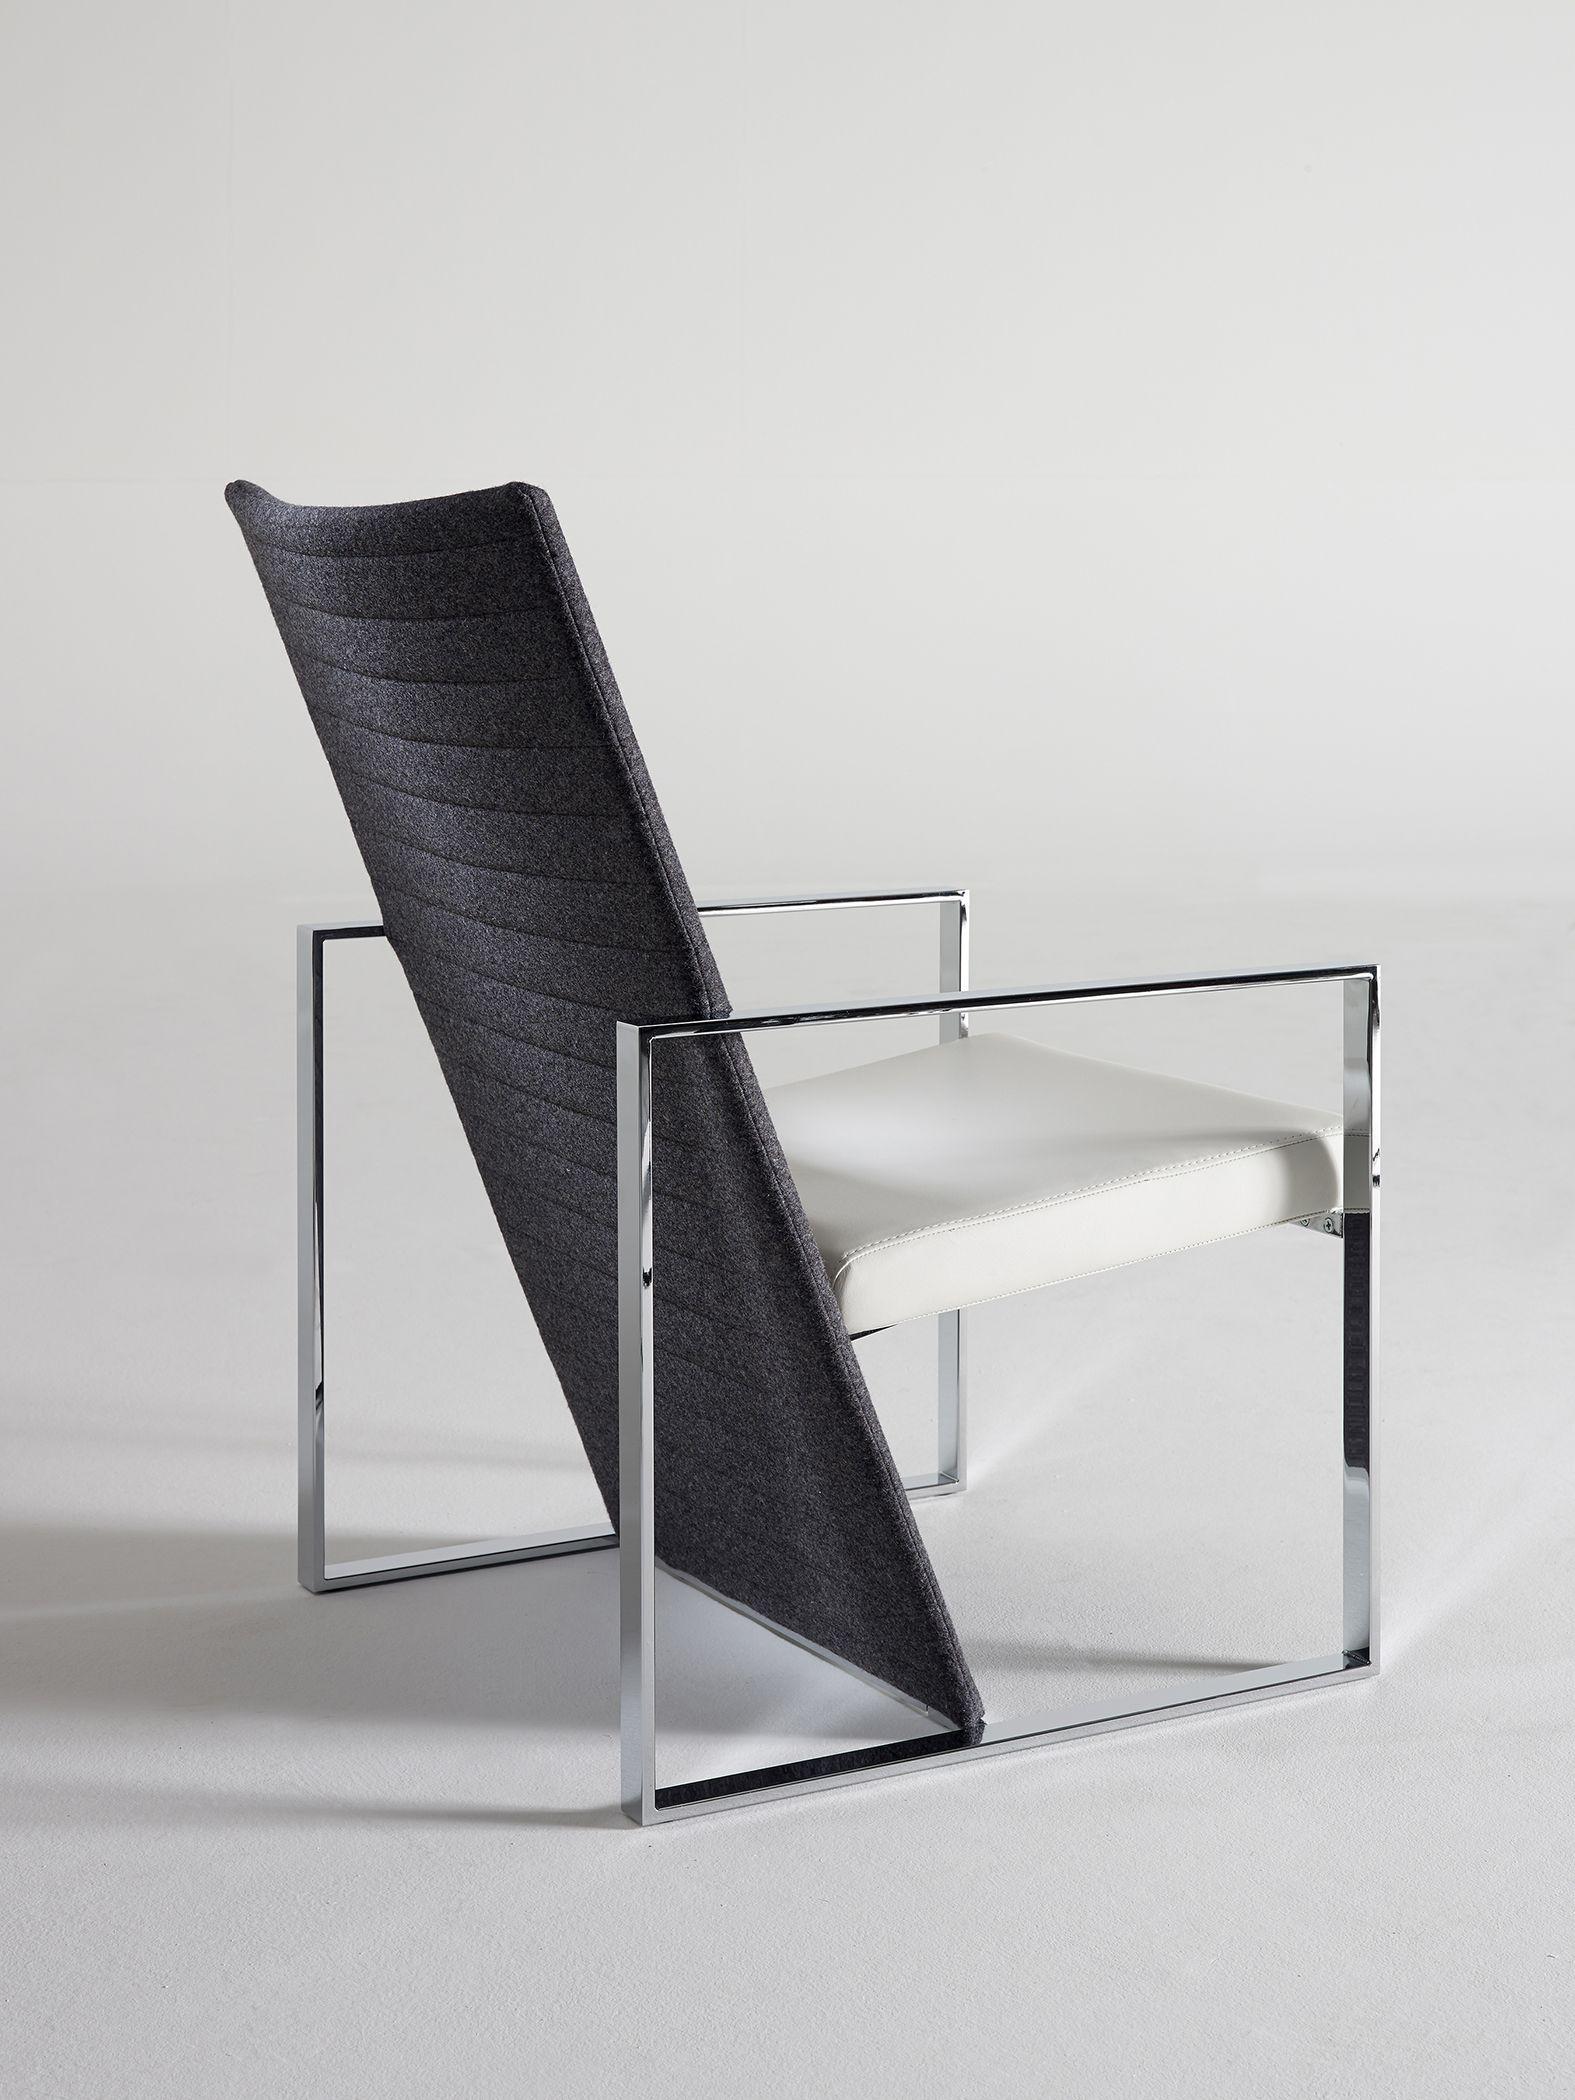 Rox from Davis Furniture